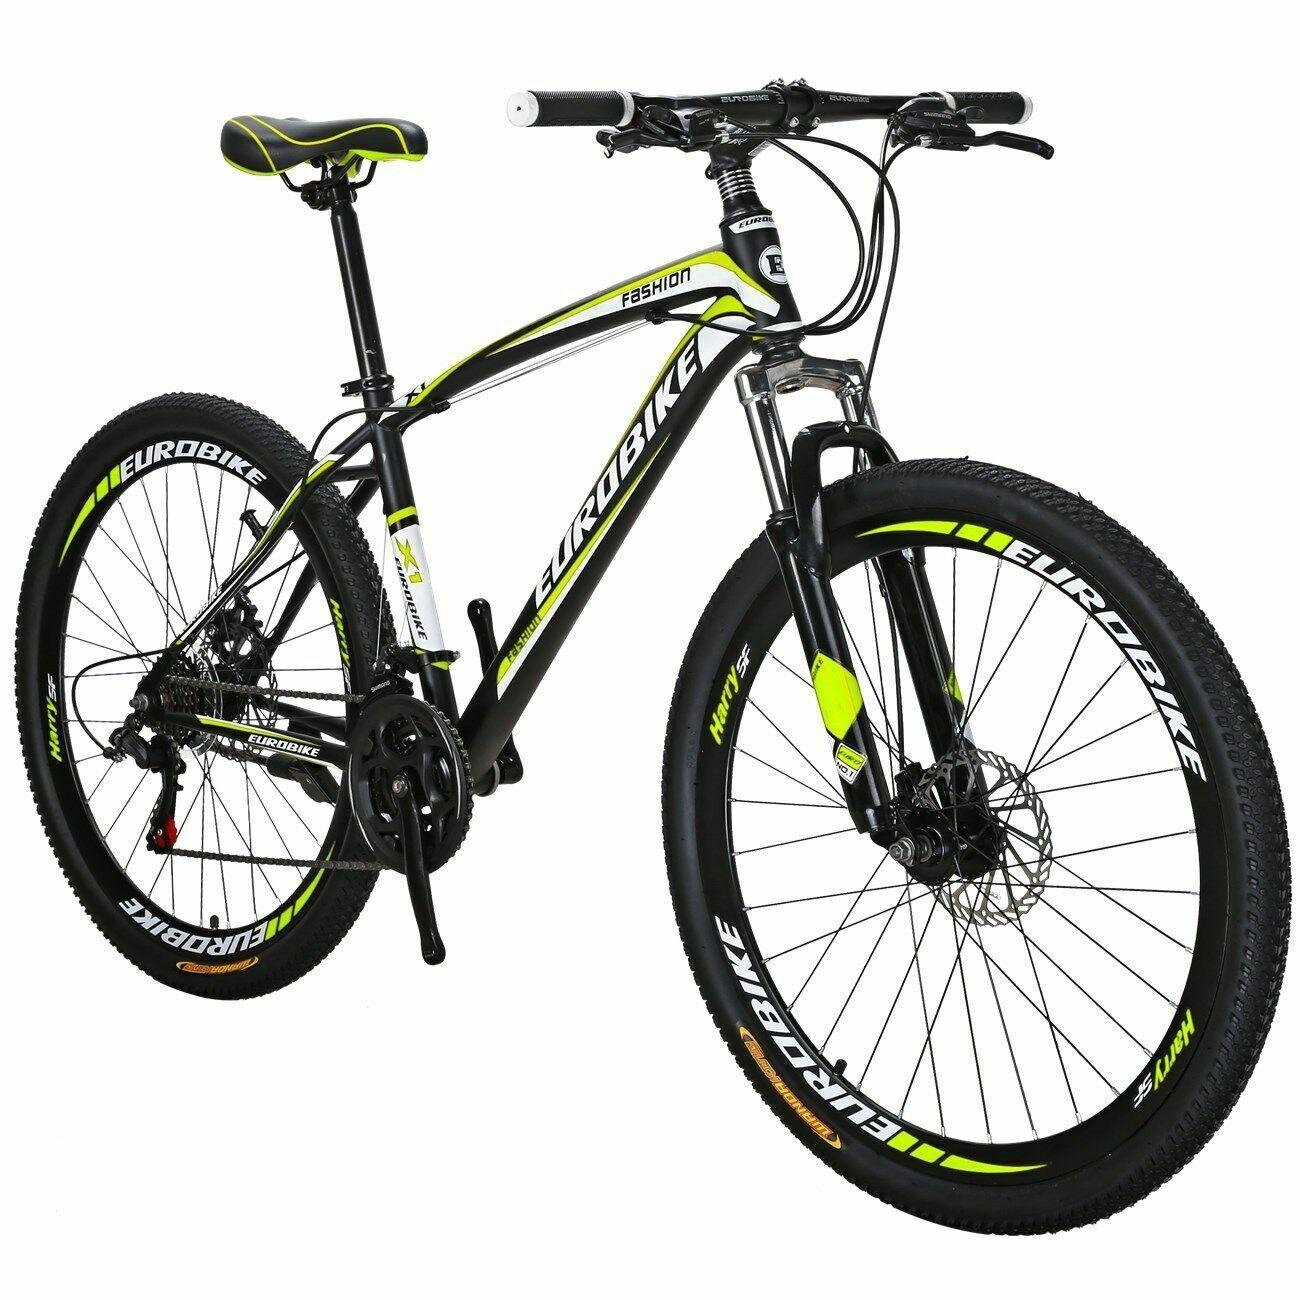 Brand New Mountain Bike Front Suspension 21 Speed Mens Bikes